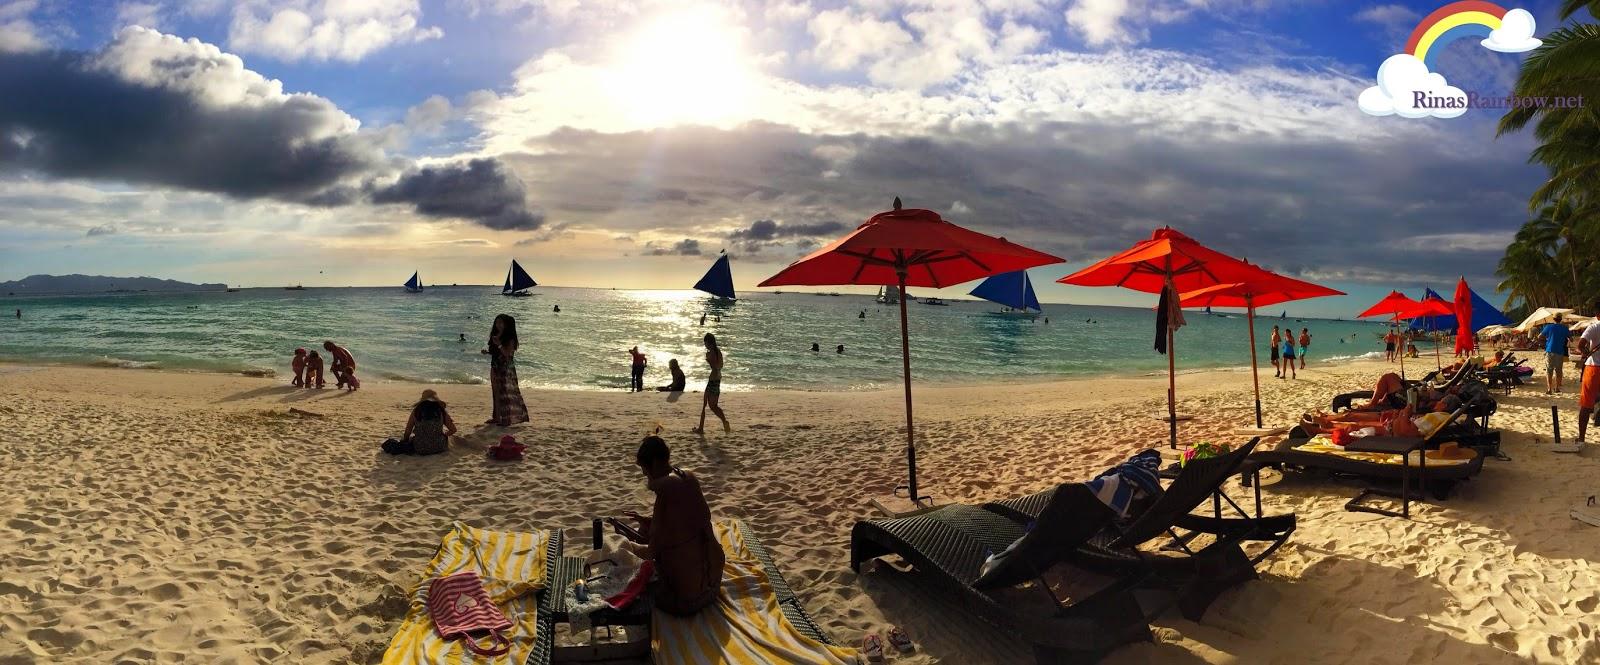 boracay beach panoramic